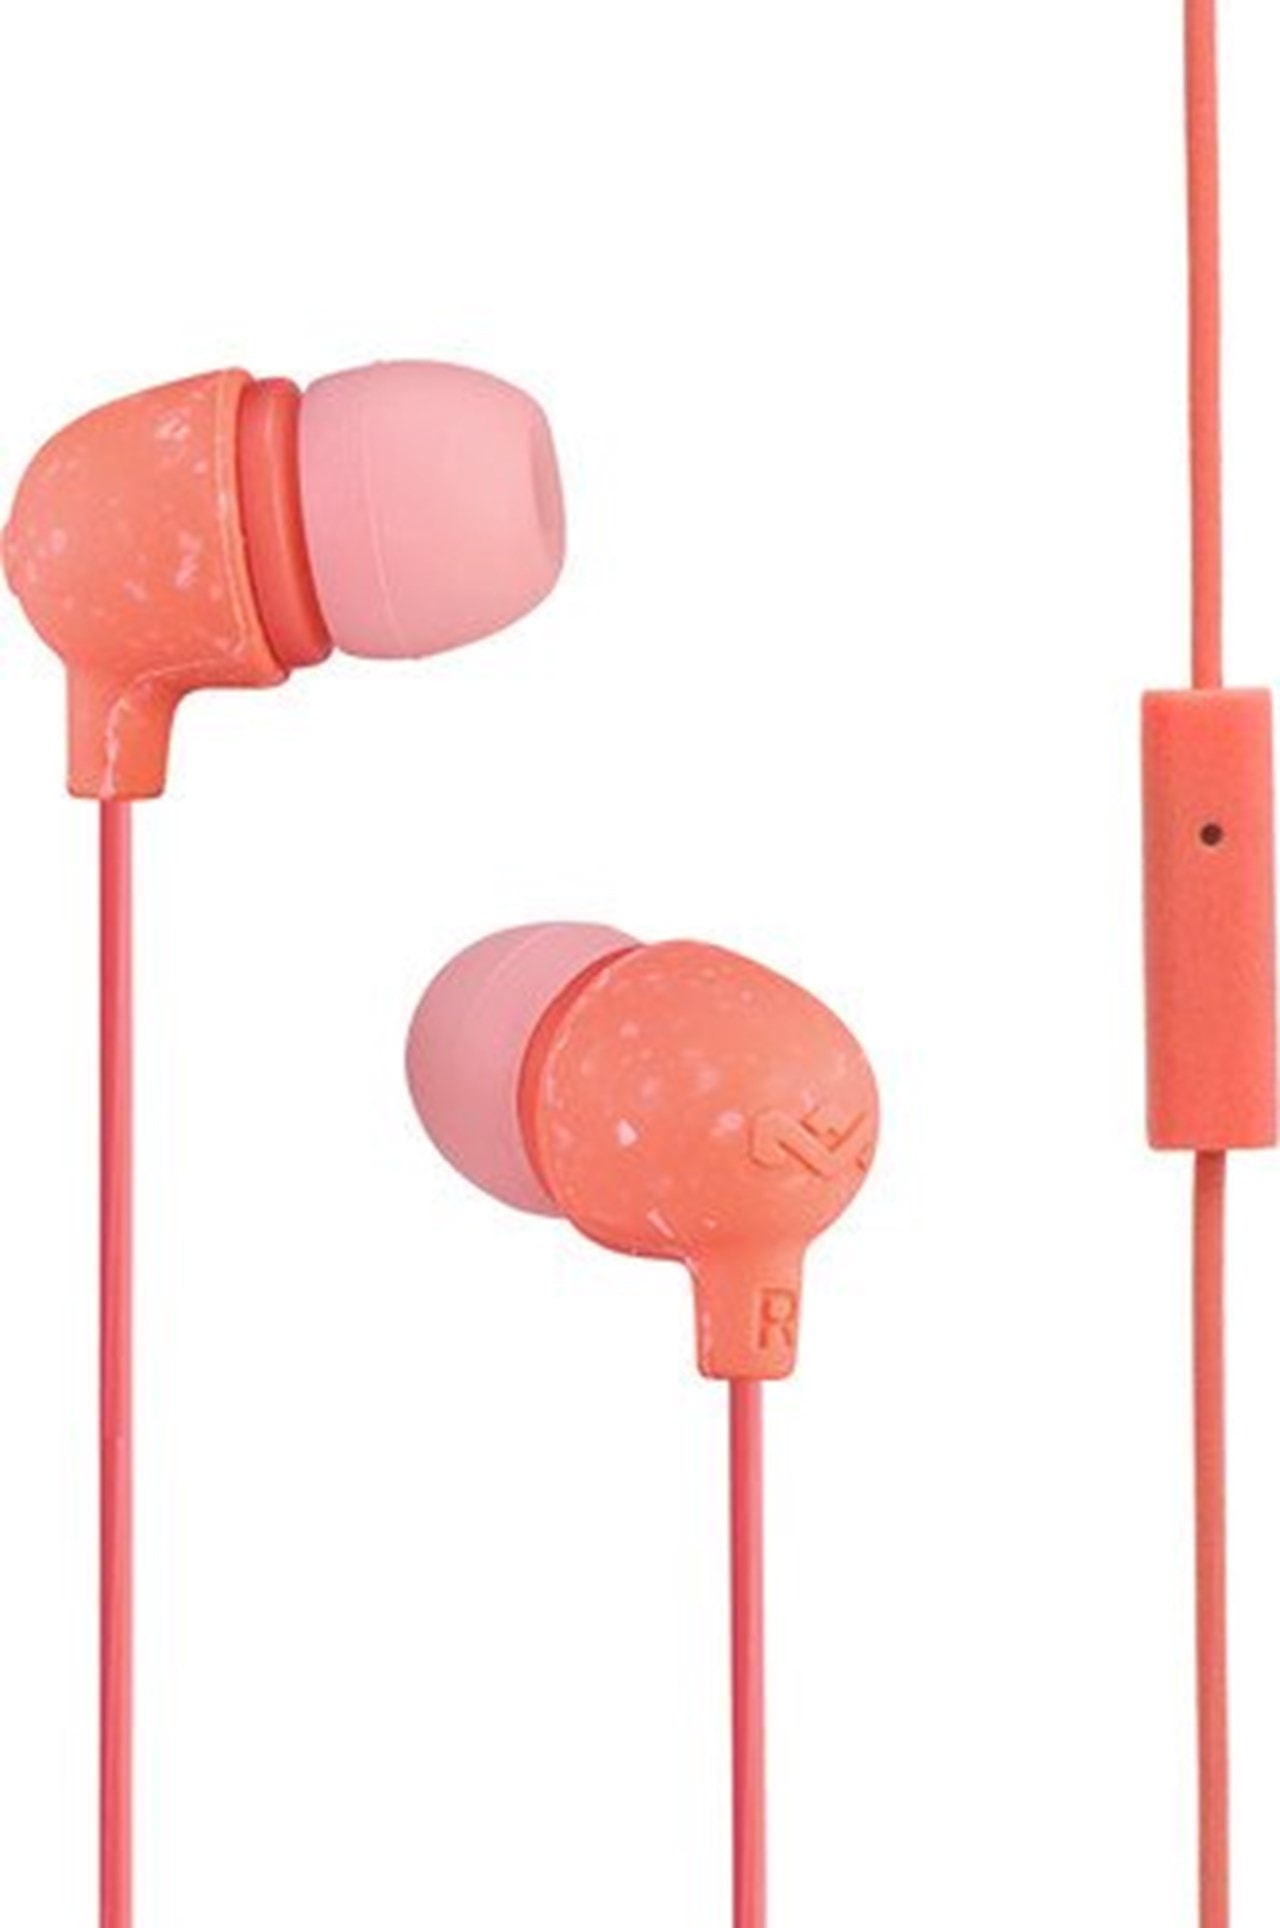 House Of Marley Little Bird Peach Earphones W/Mic - 1